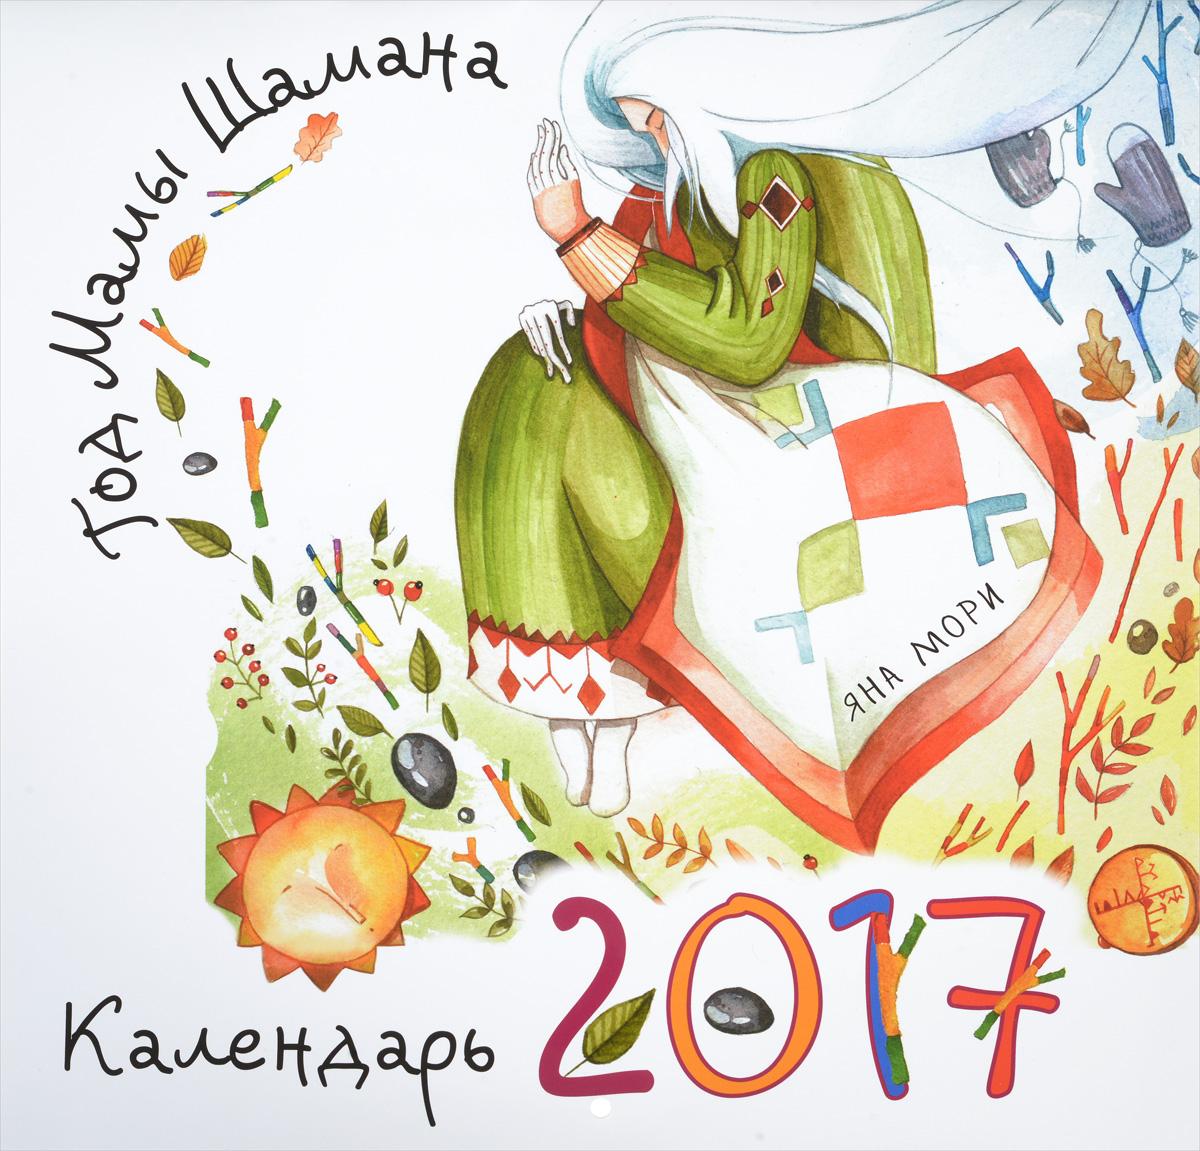 Я. Мори Календарь 2017 (на скрепке). Год Мамы Шамана василий маханенко путь шамана час боли